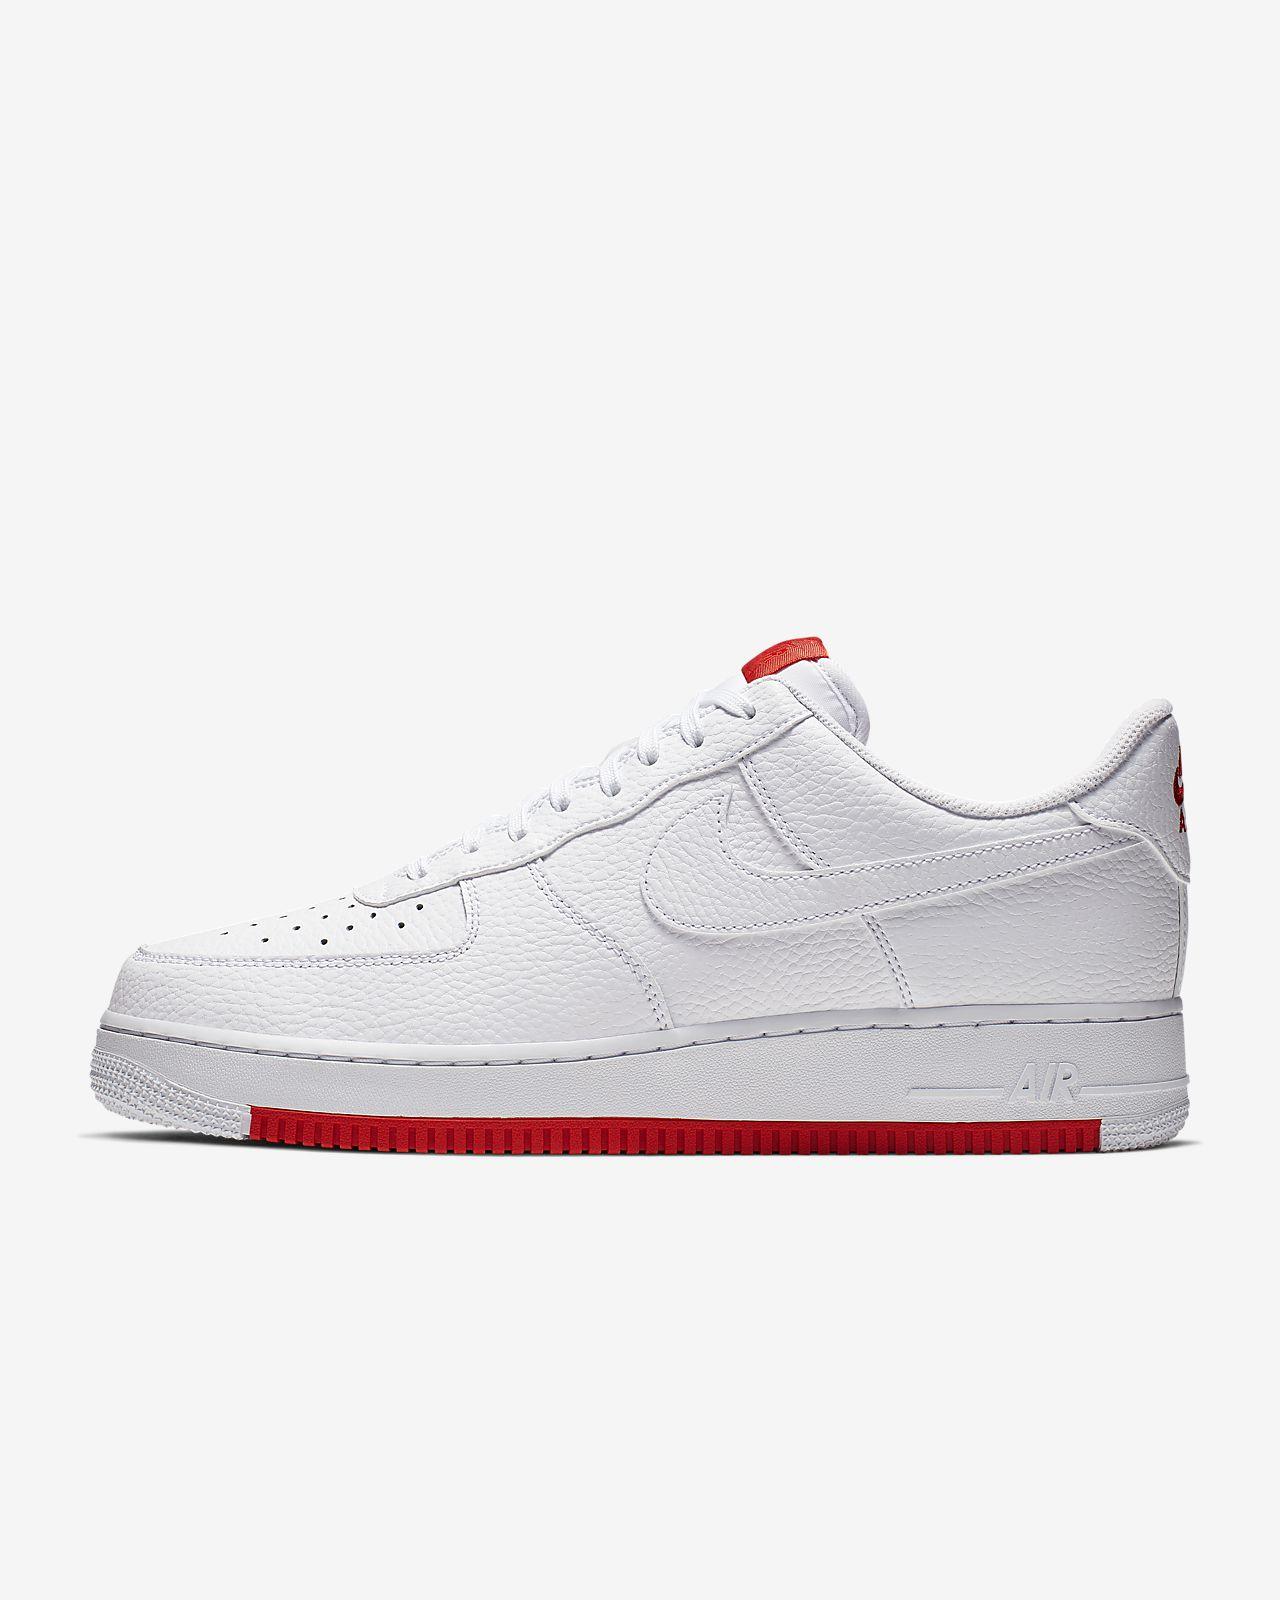 HommeCa '07 Force Chaussure 1 Nike Pour Air dhrstQ